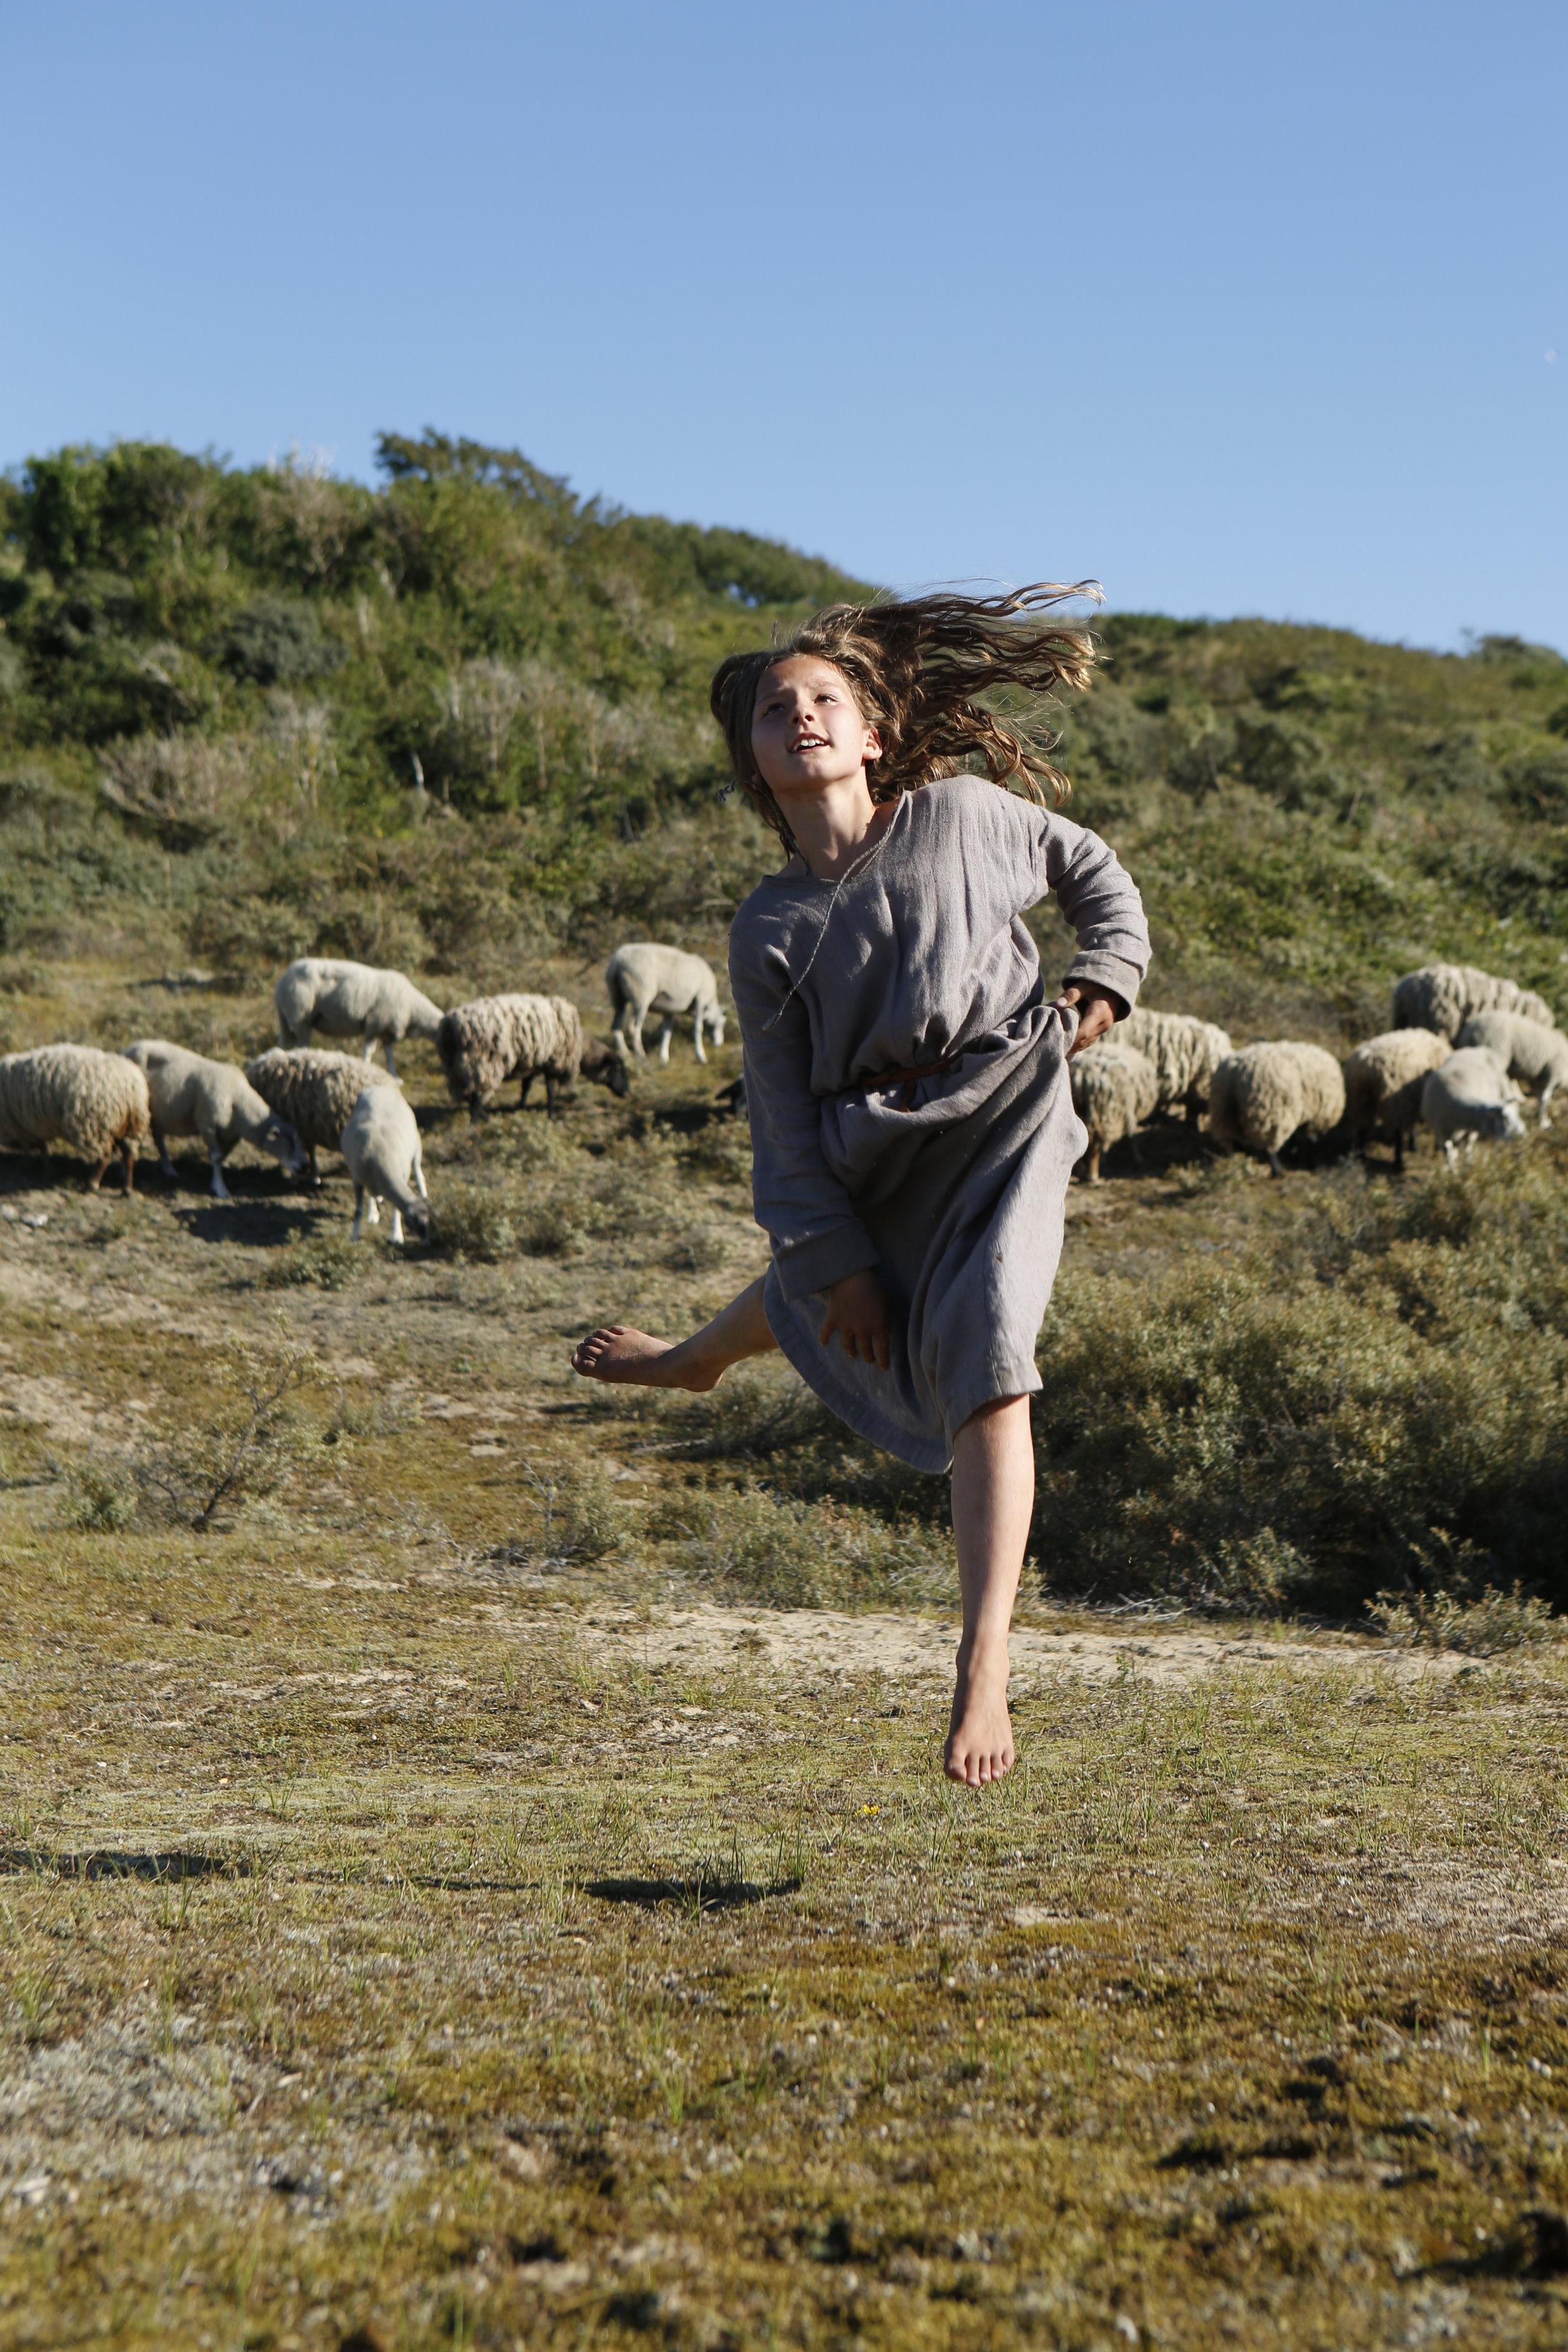 JEANNETTE, L'ENFANCE DE JEANNE D'ARC_Photographe.R.Arpajou©TAOS Films - ARTE France_ARP8931.JPG